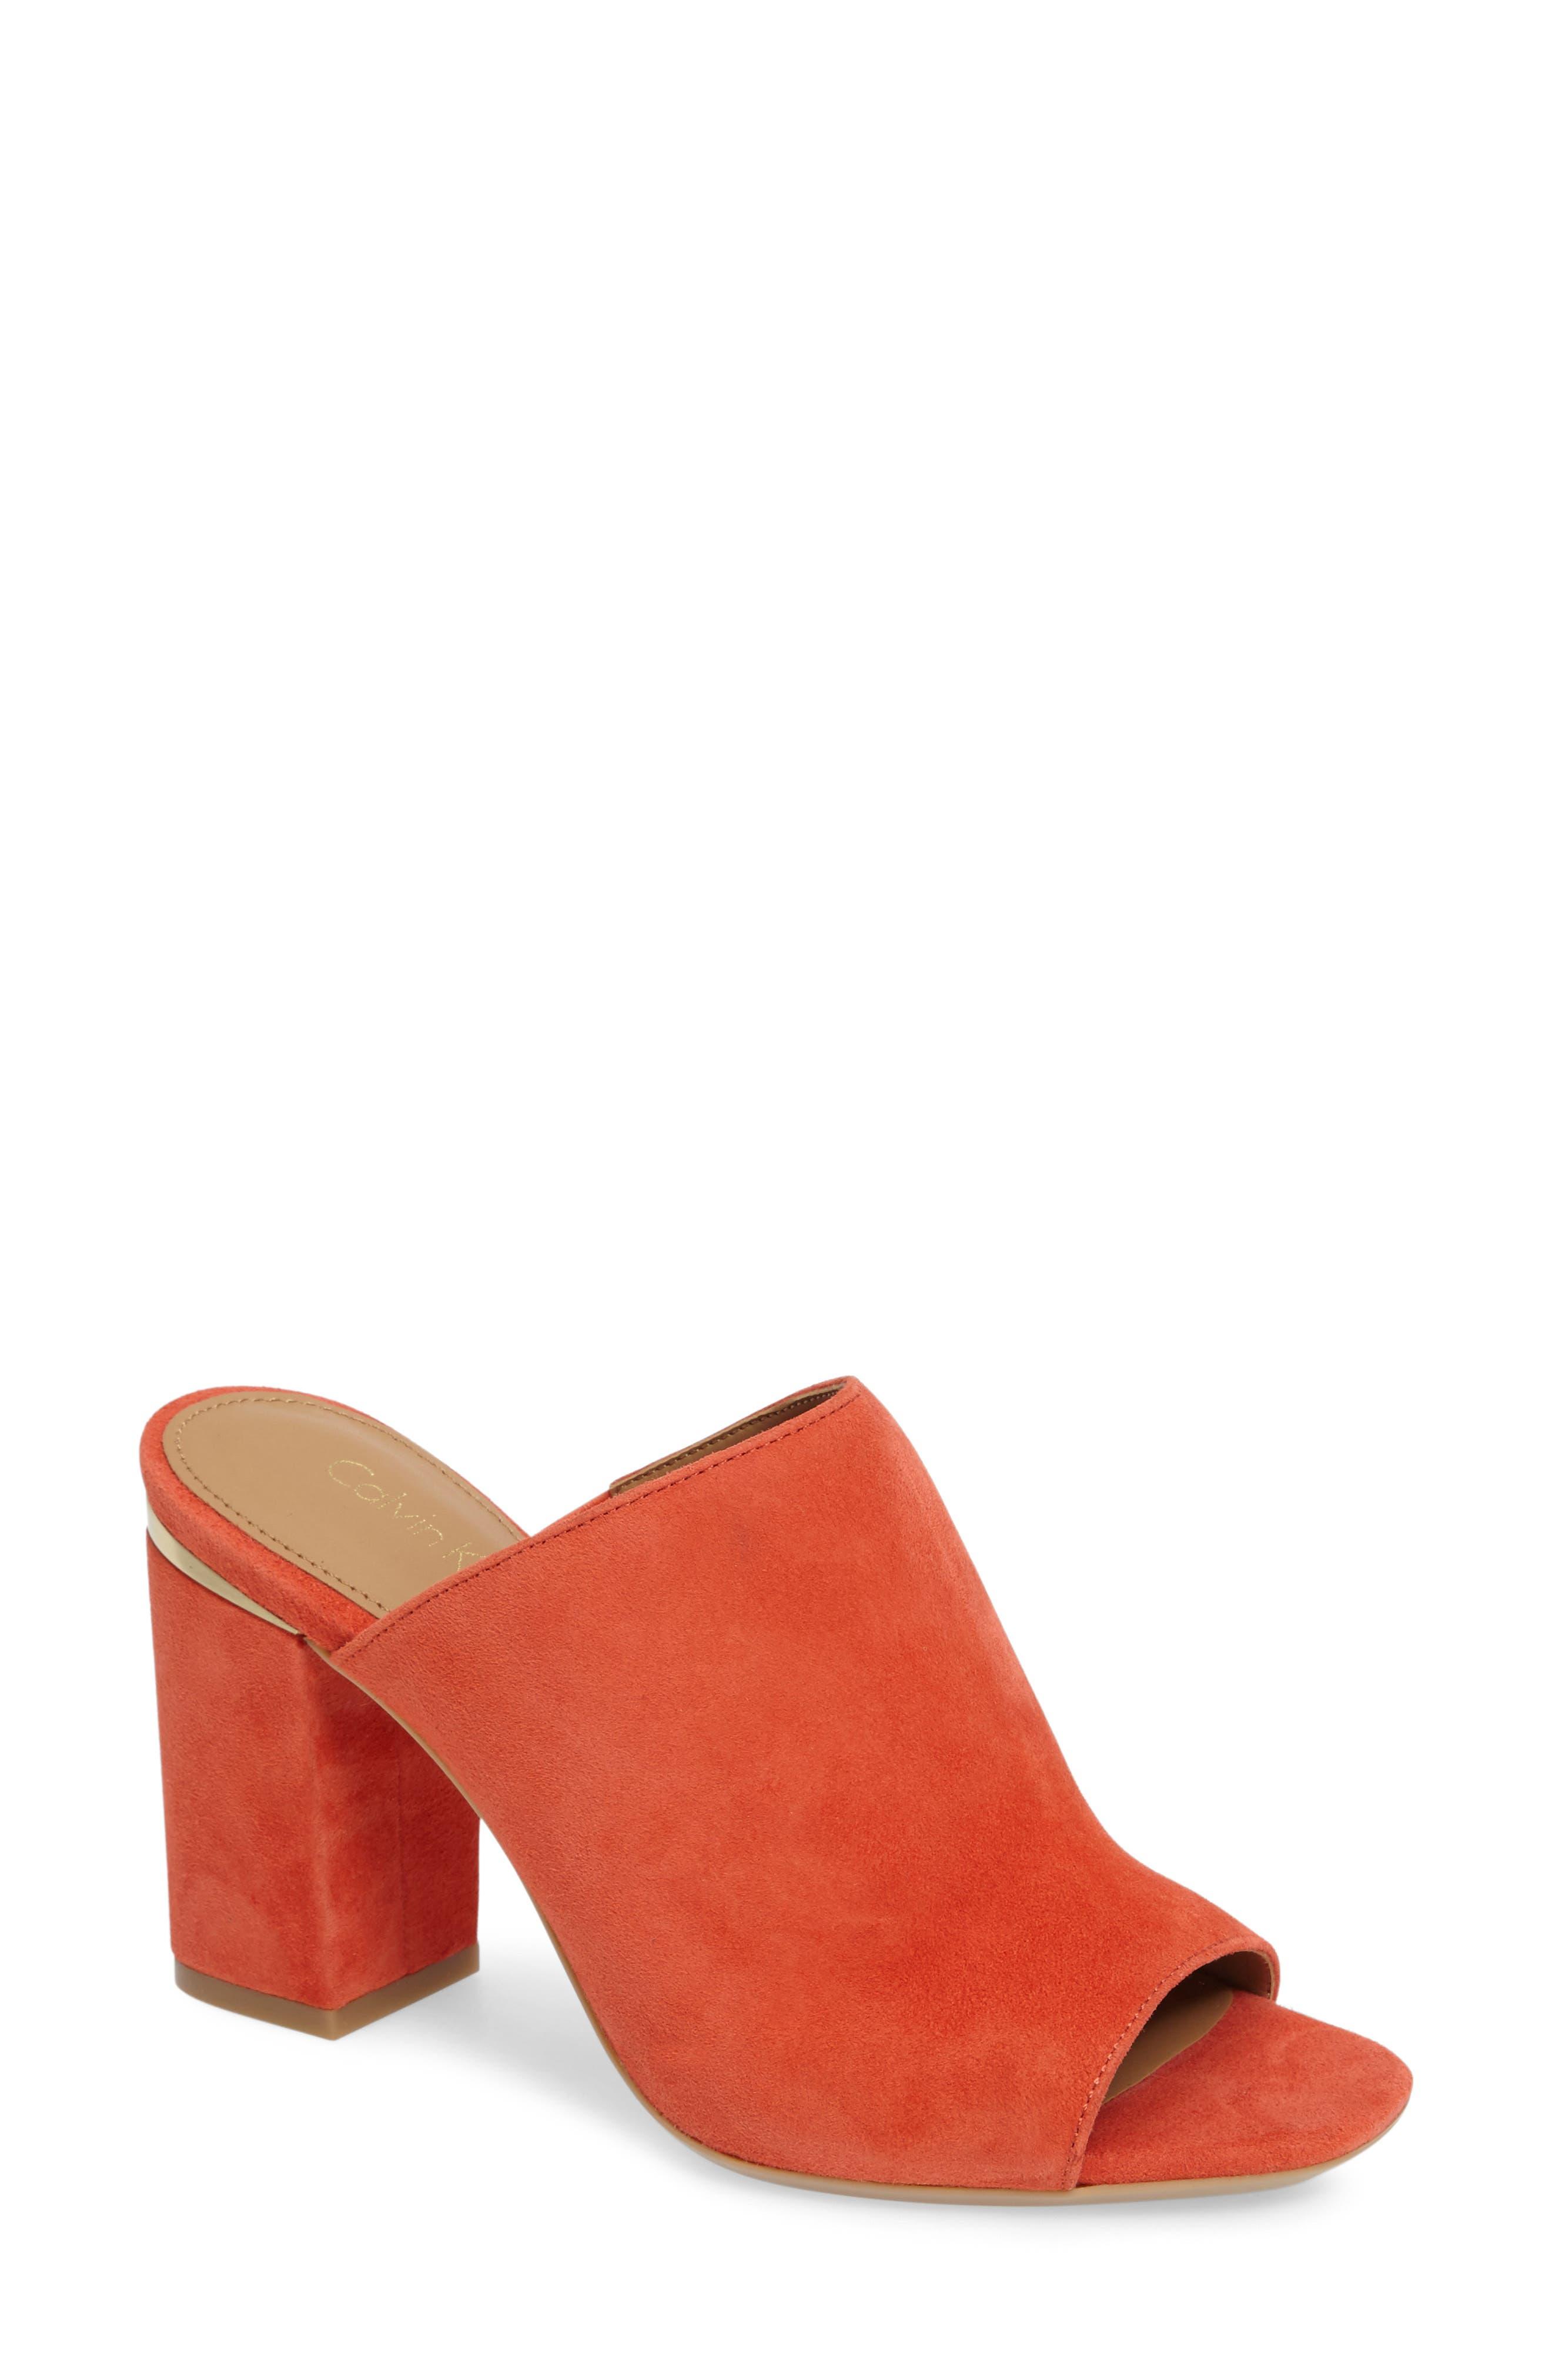 Alternate Image 1 Selected - Calvin Klein Cicelle Mule (Women)